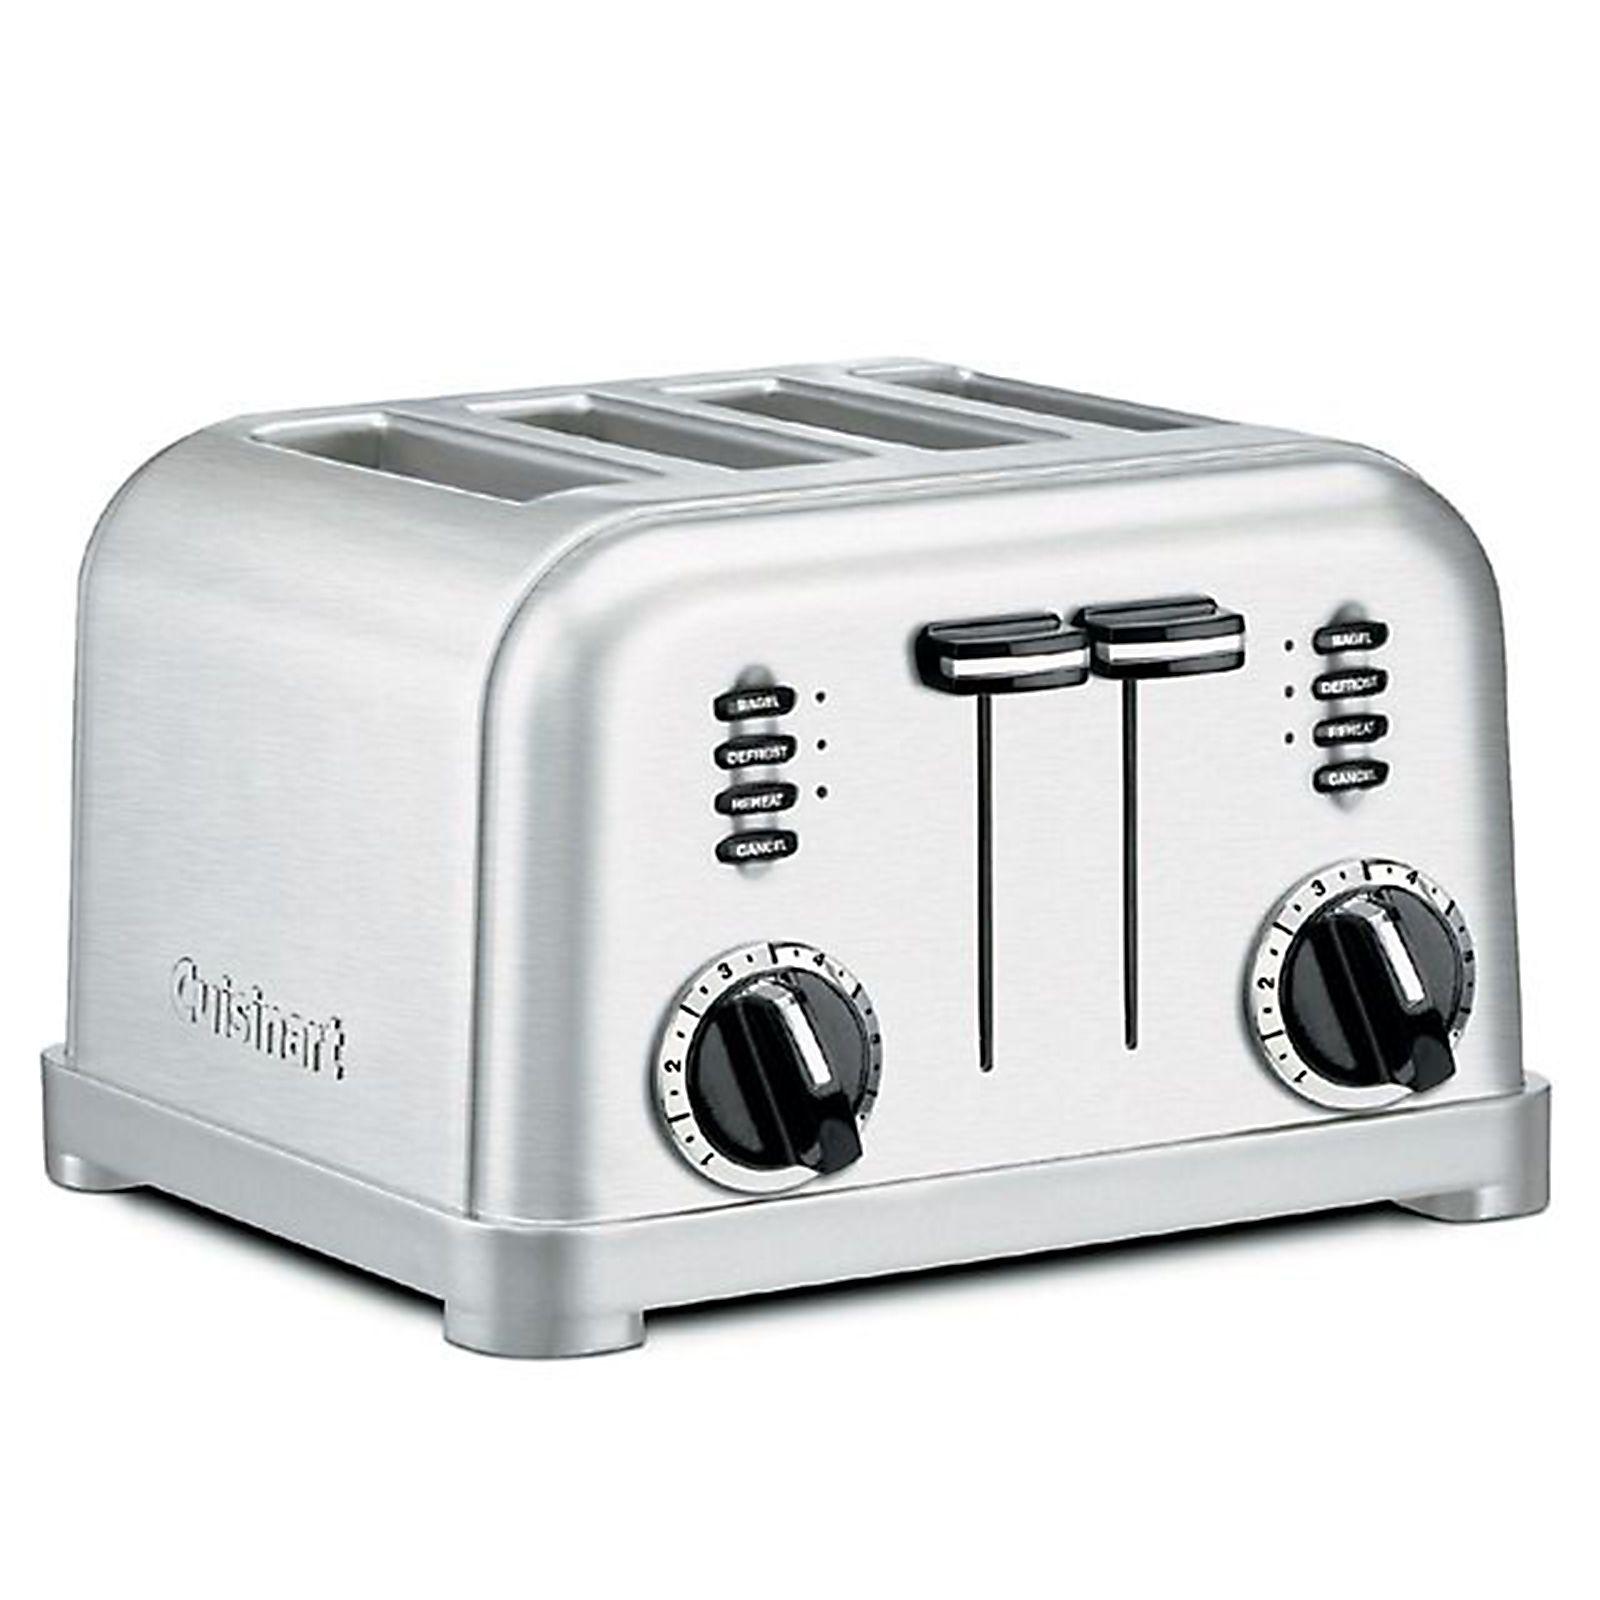 Cuisinart 4-Slice Toaster - Stainless Steel (Silver)